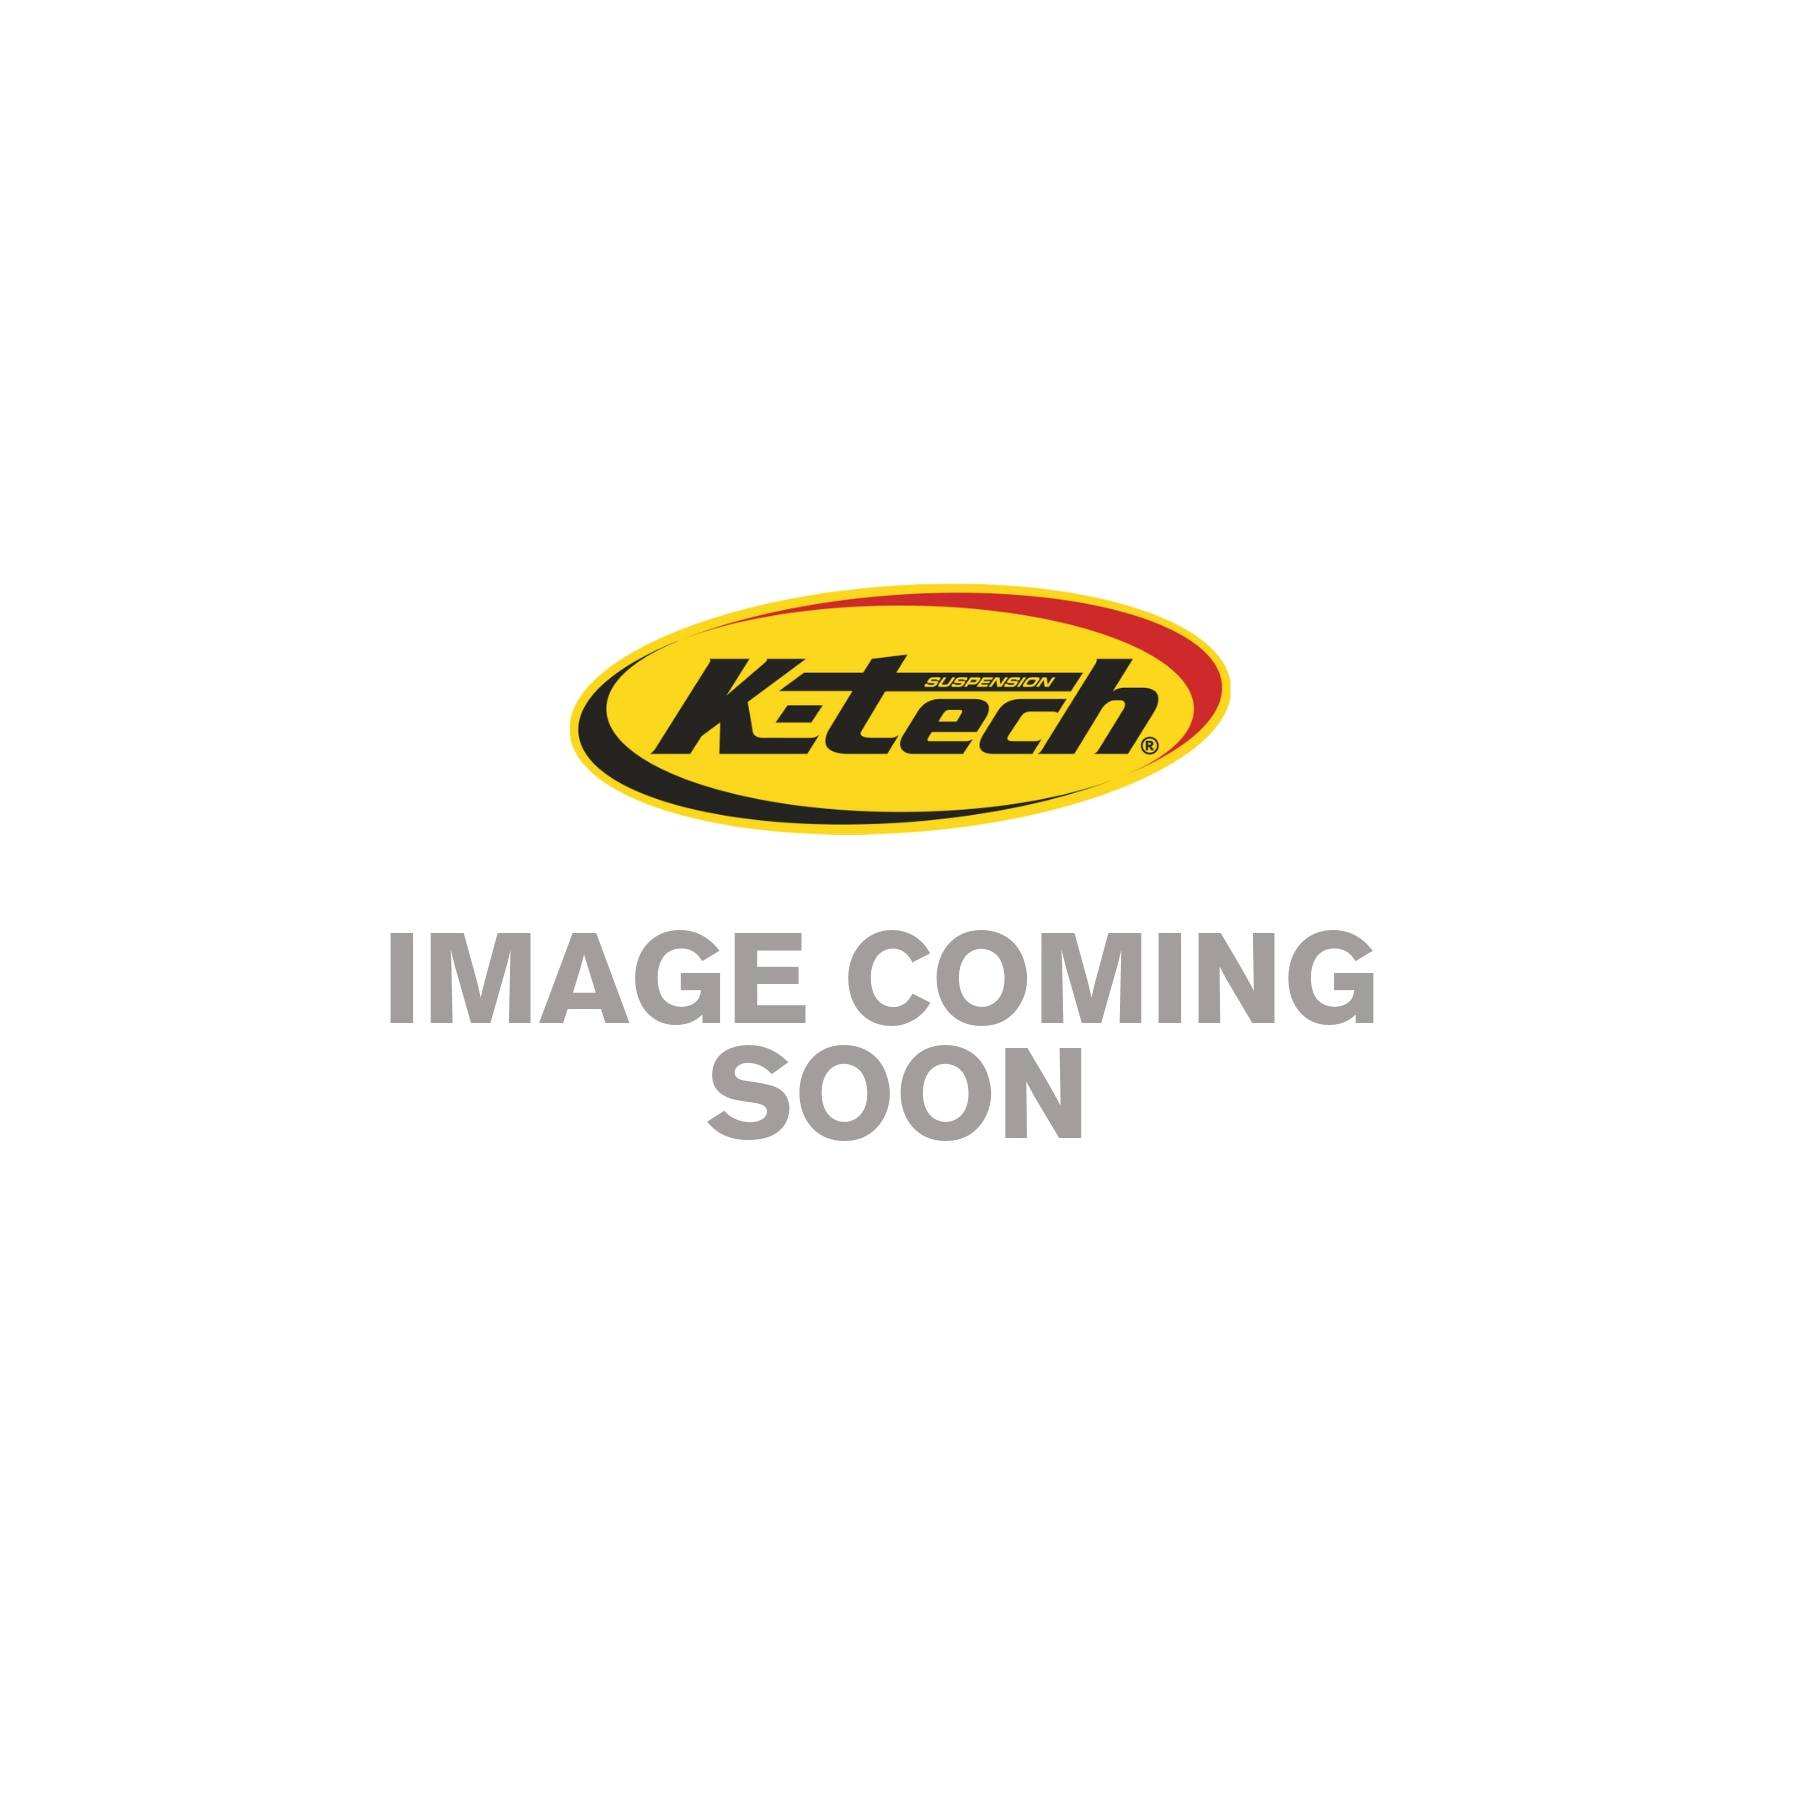 25IDS Front Fork Cartridges Harley Davidson XR1200X 2011> Showa